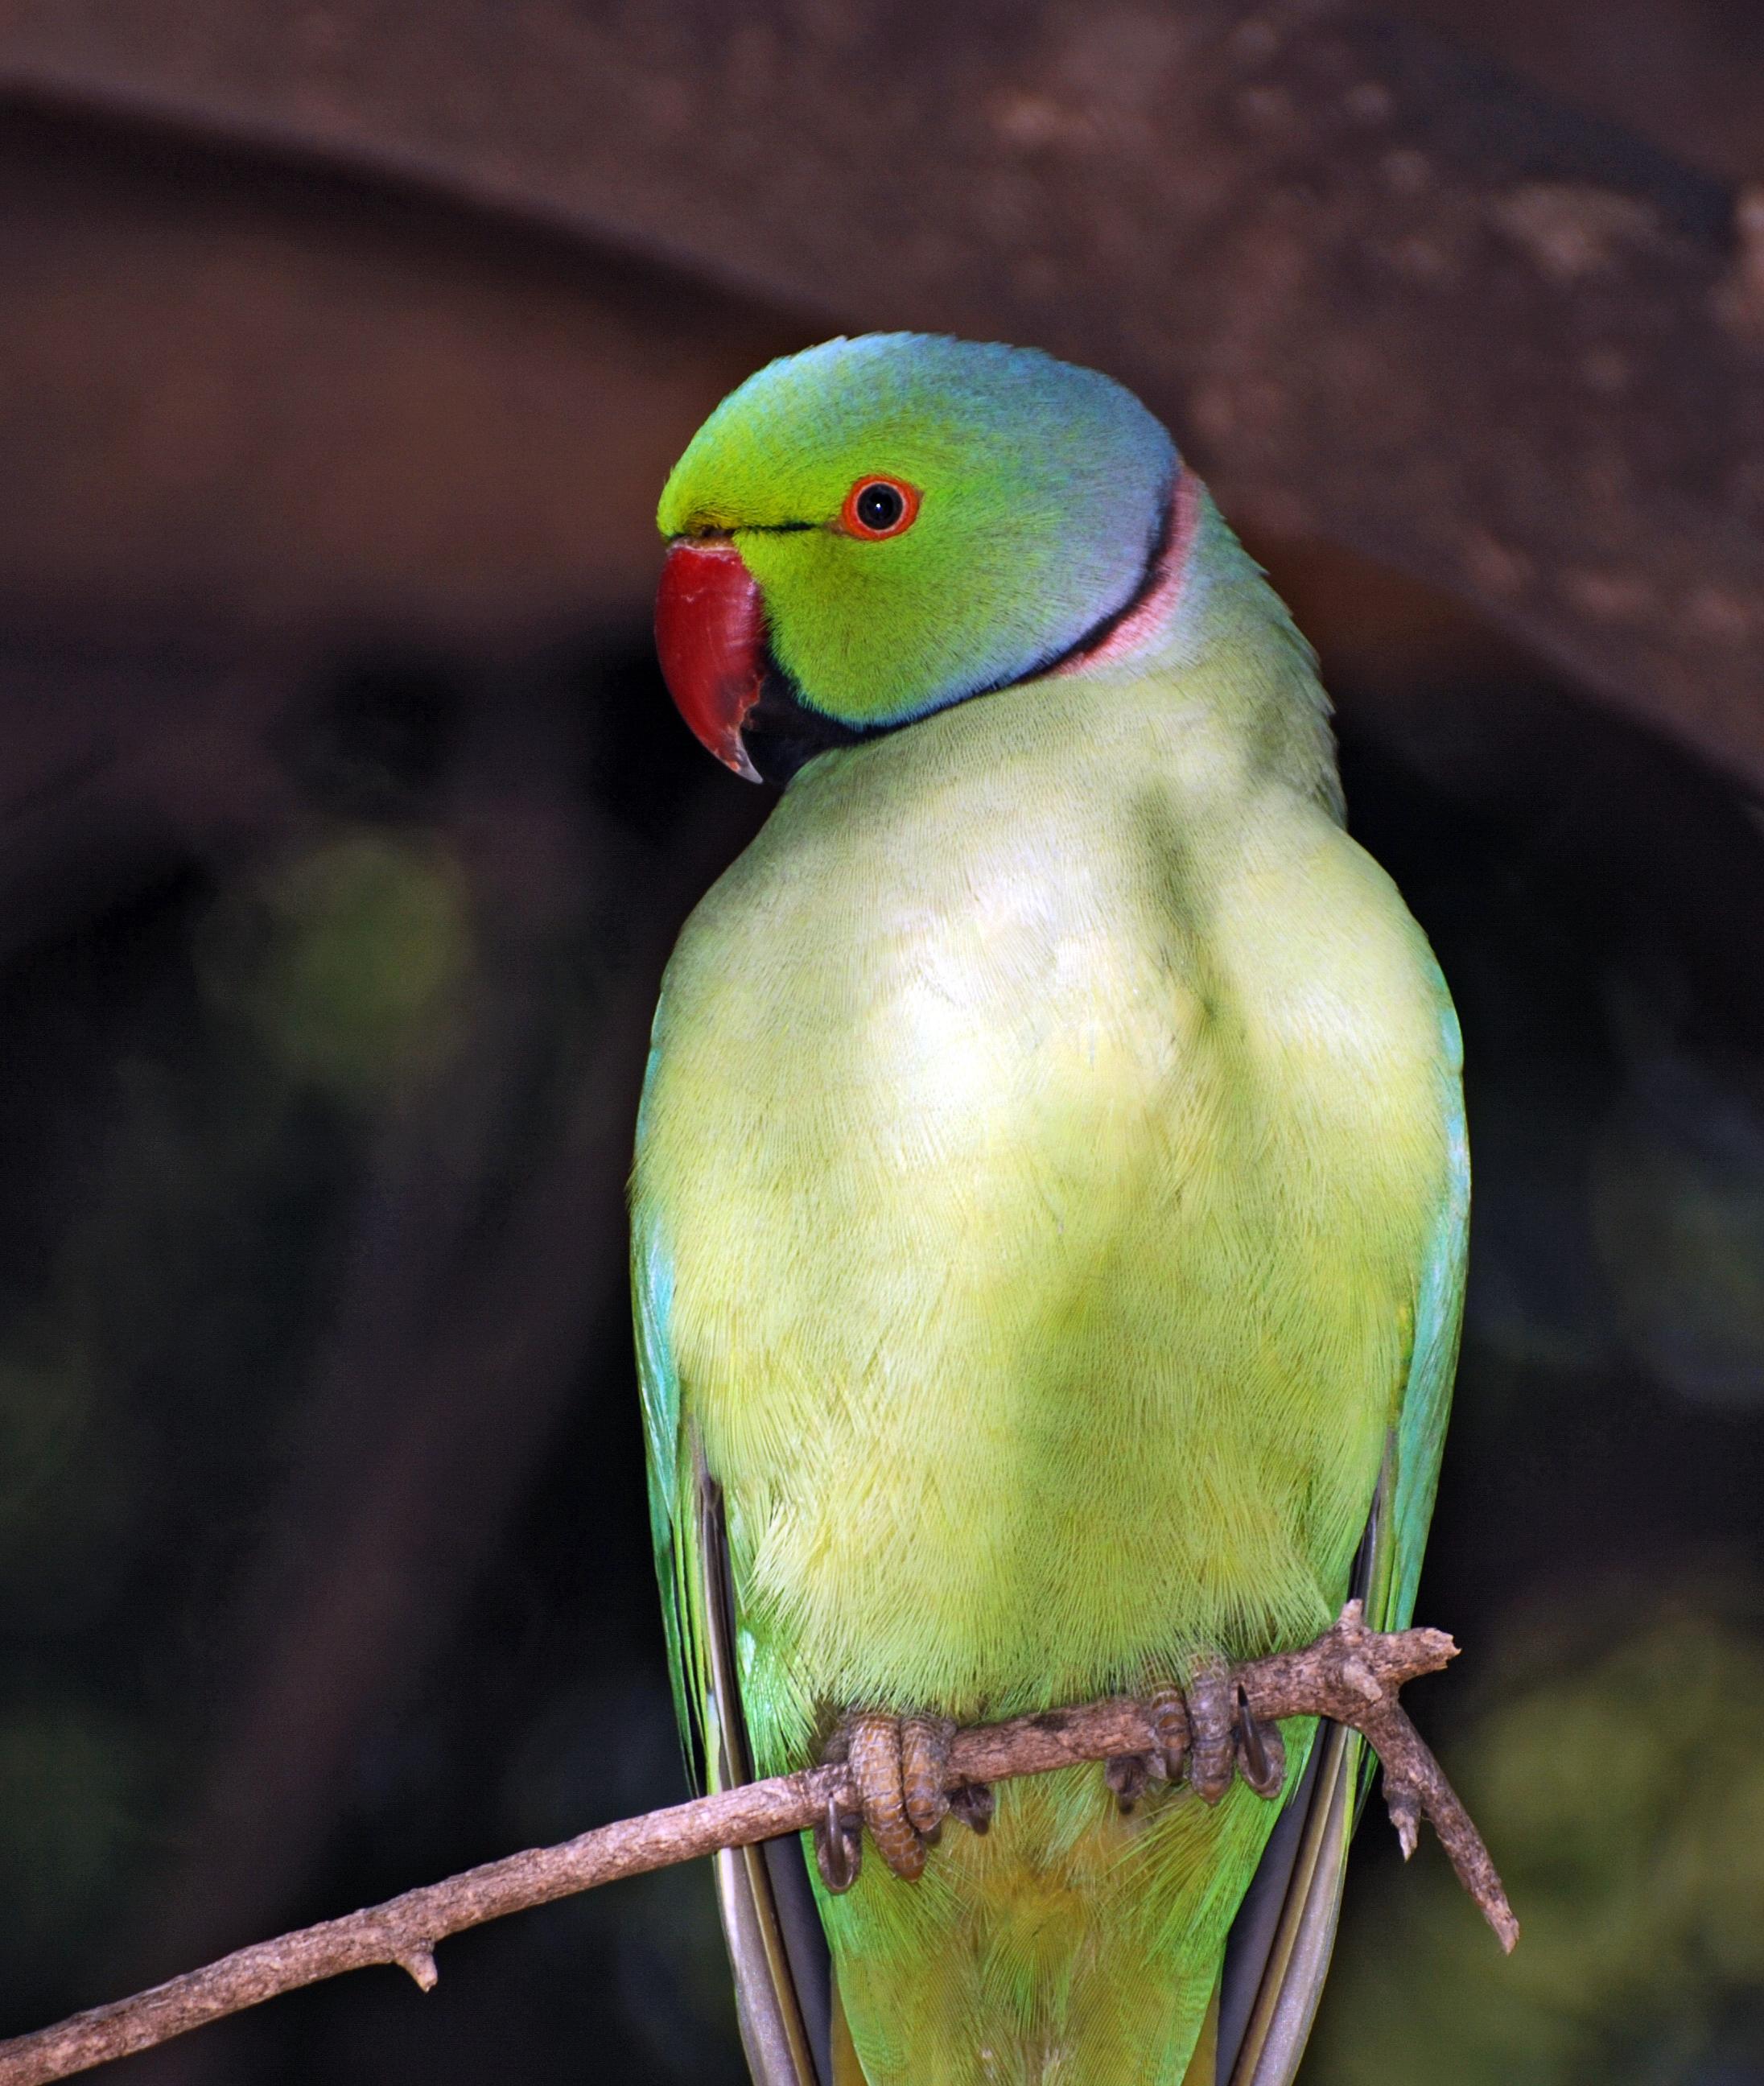 File:Parrot India 2.jpg - Wikipedia